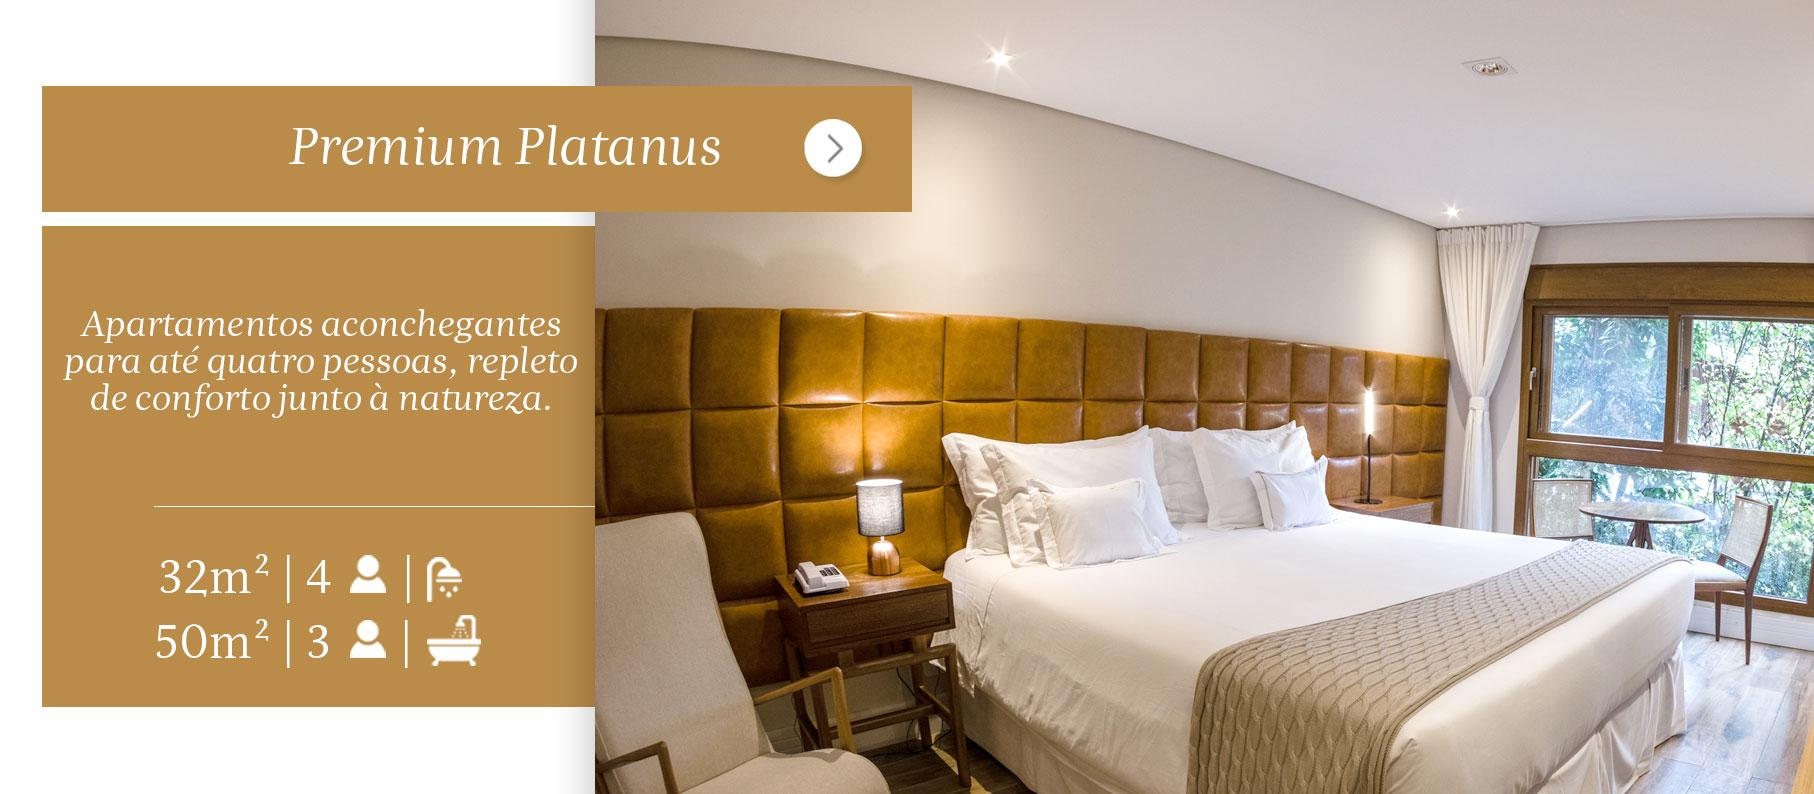 platanus-hotel-boutique-quebra-noz-conforto-e-natureza-2